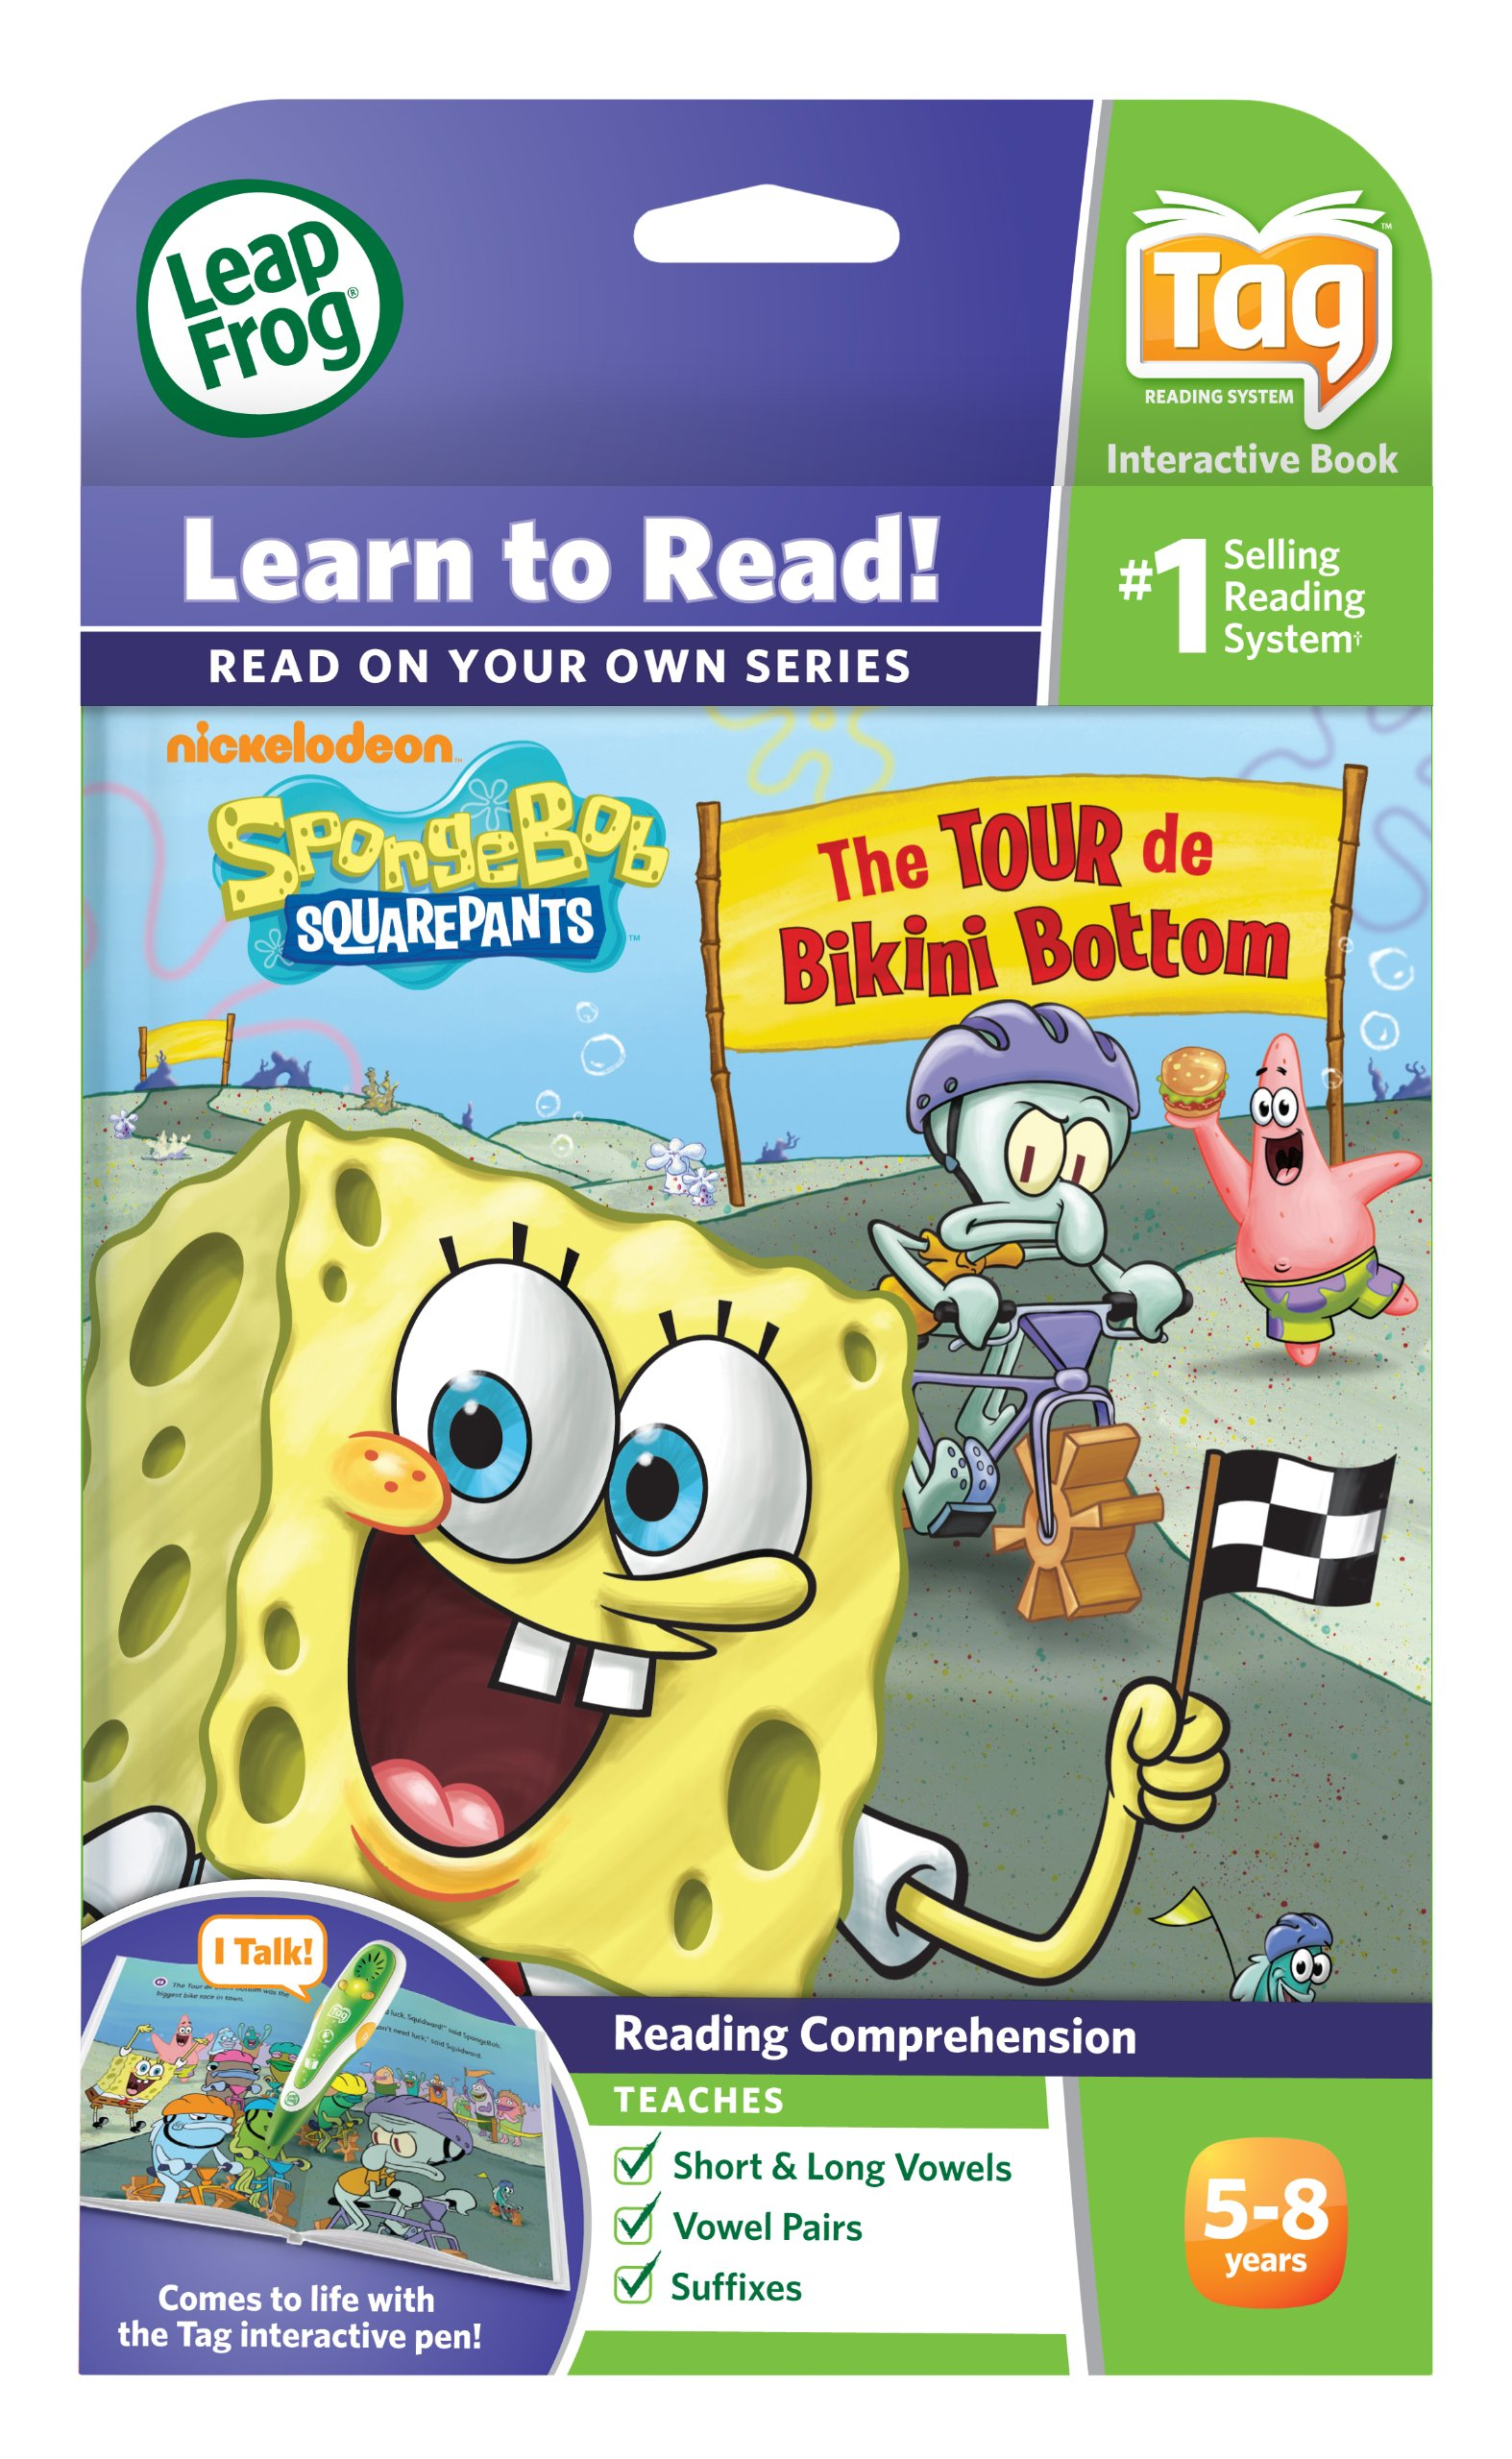 Leapfrog Tag Activity Storybook Spongebob Squarepants: The Tour De Bikini Bottom by LeapFrog (Image #5)